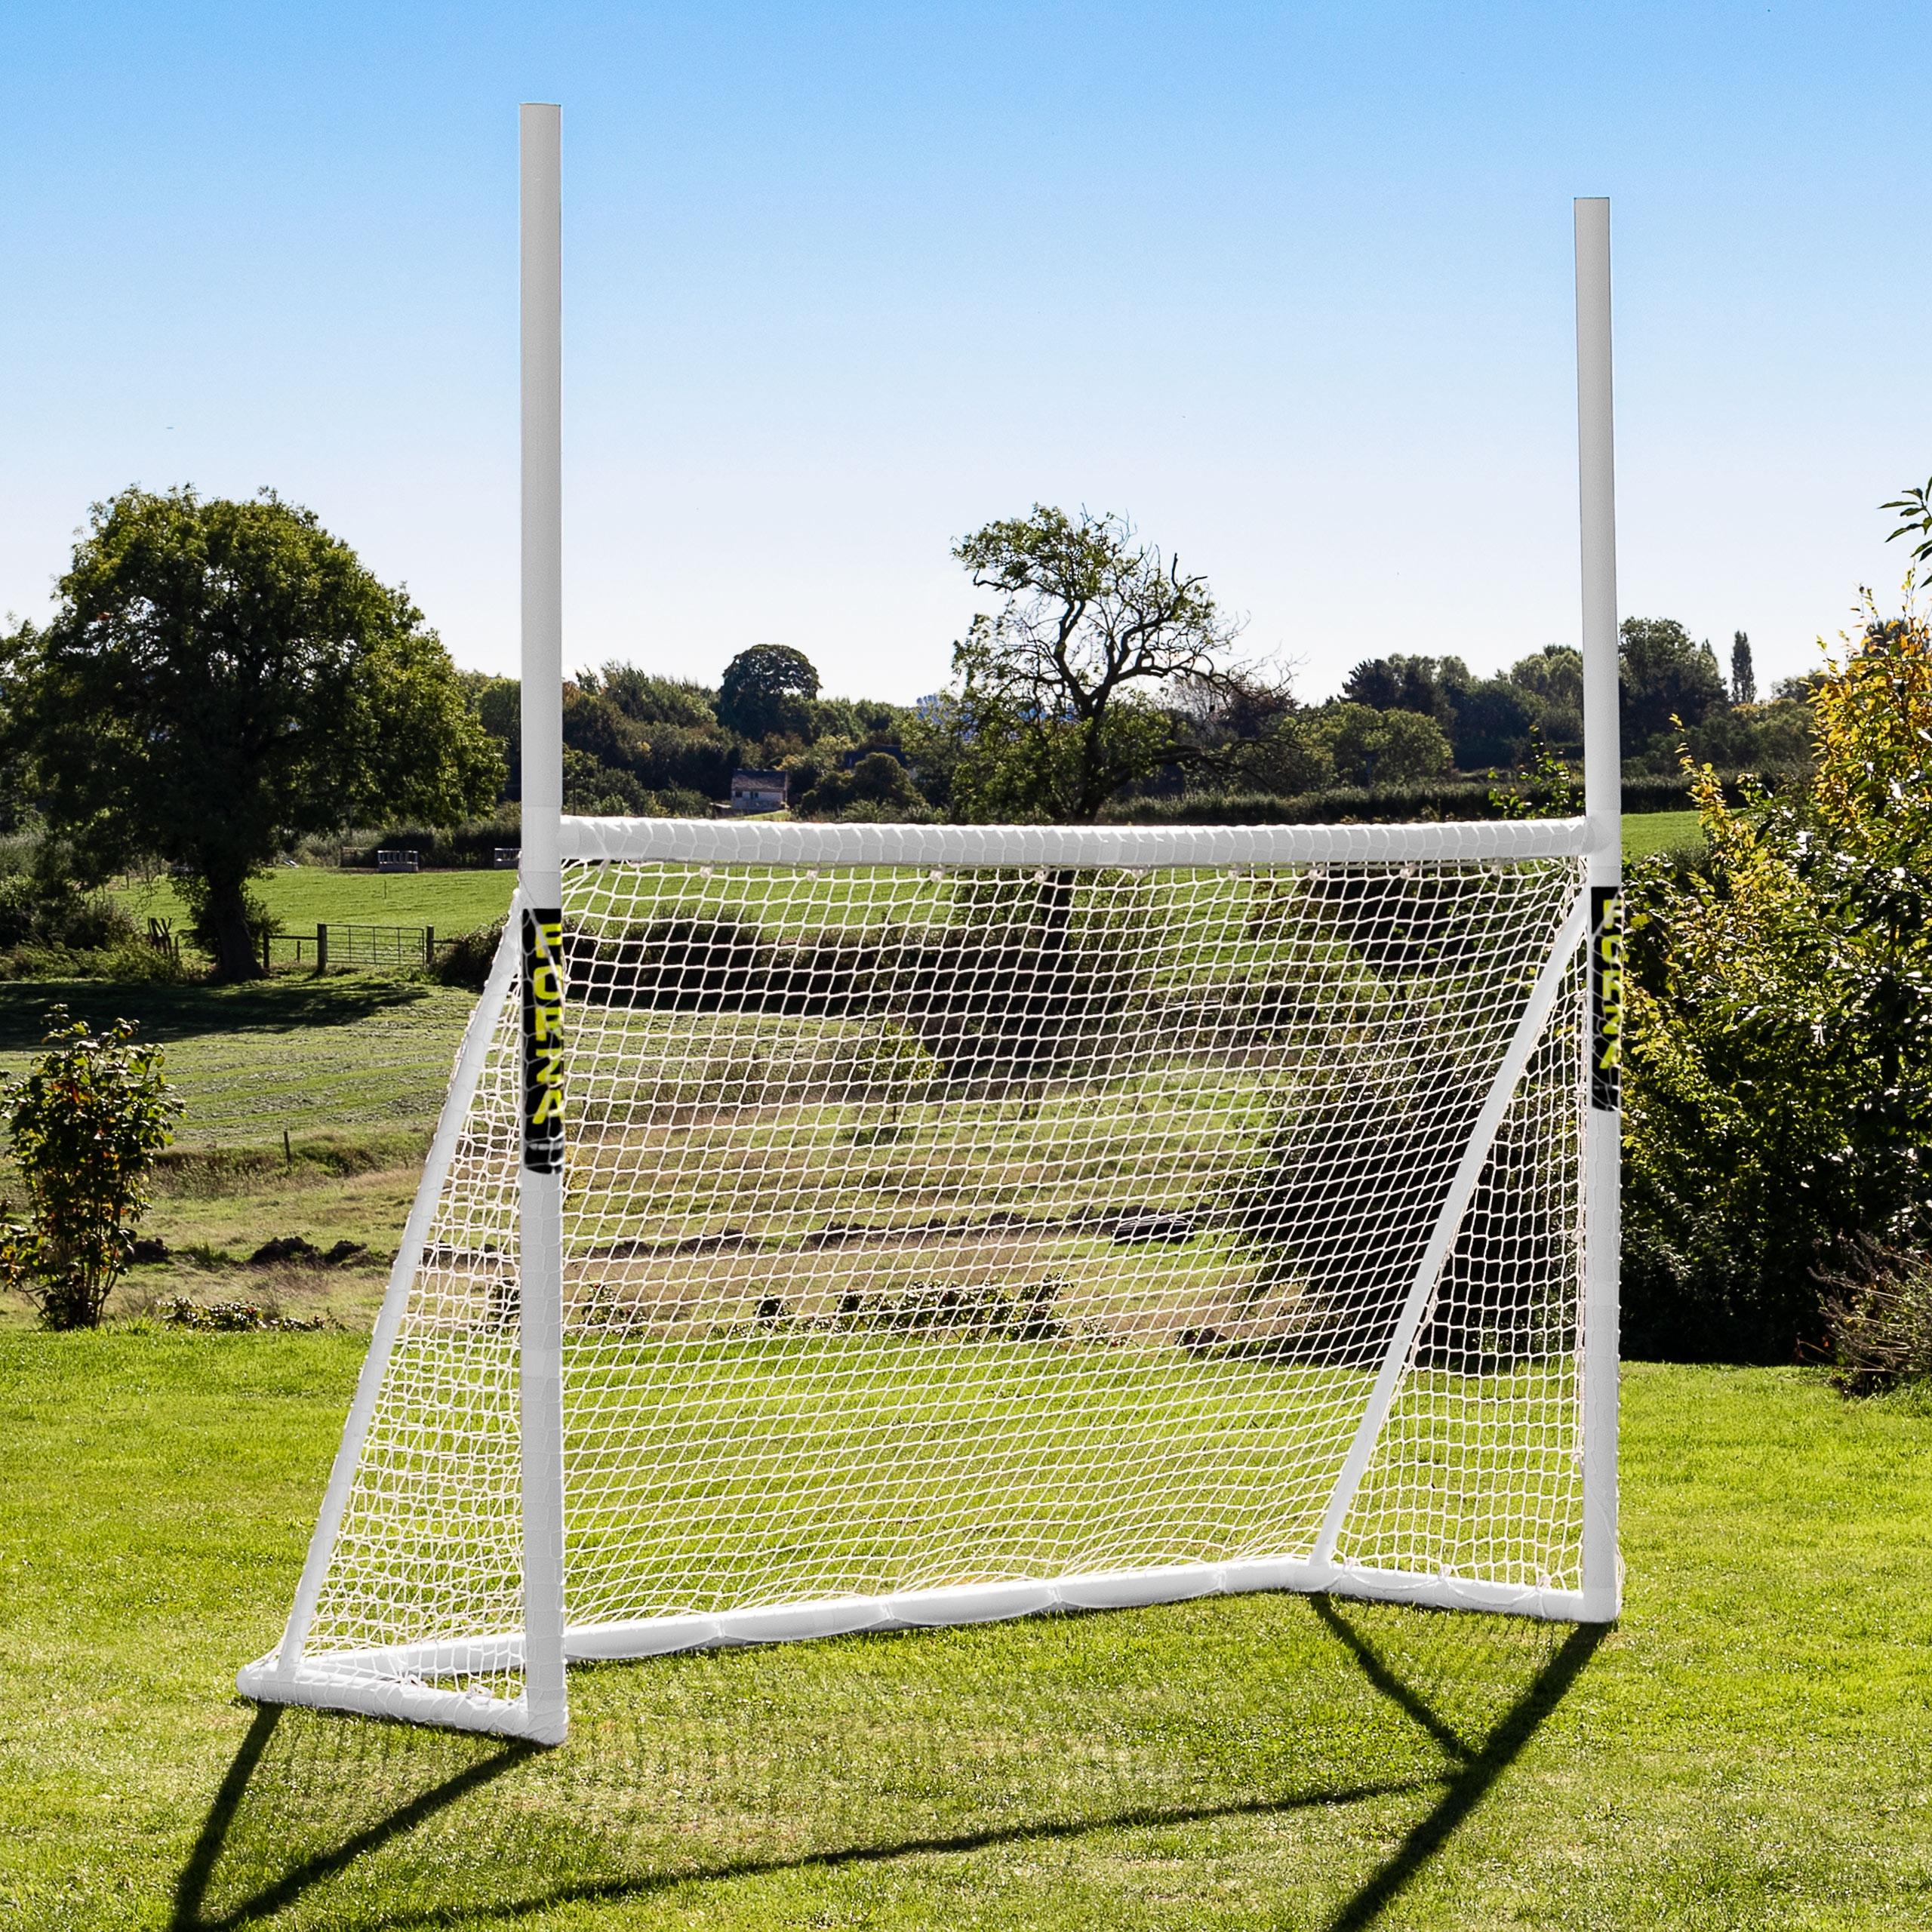 8 X 5 Forza Gaa Gaelic Football & Hurling Goal Posts dedans Goal De Foot Pour Jardin